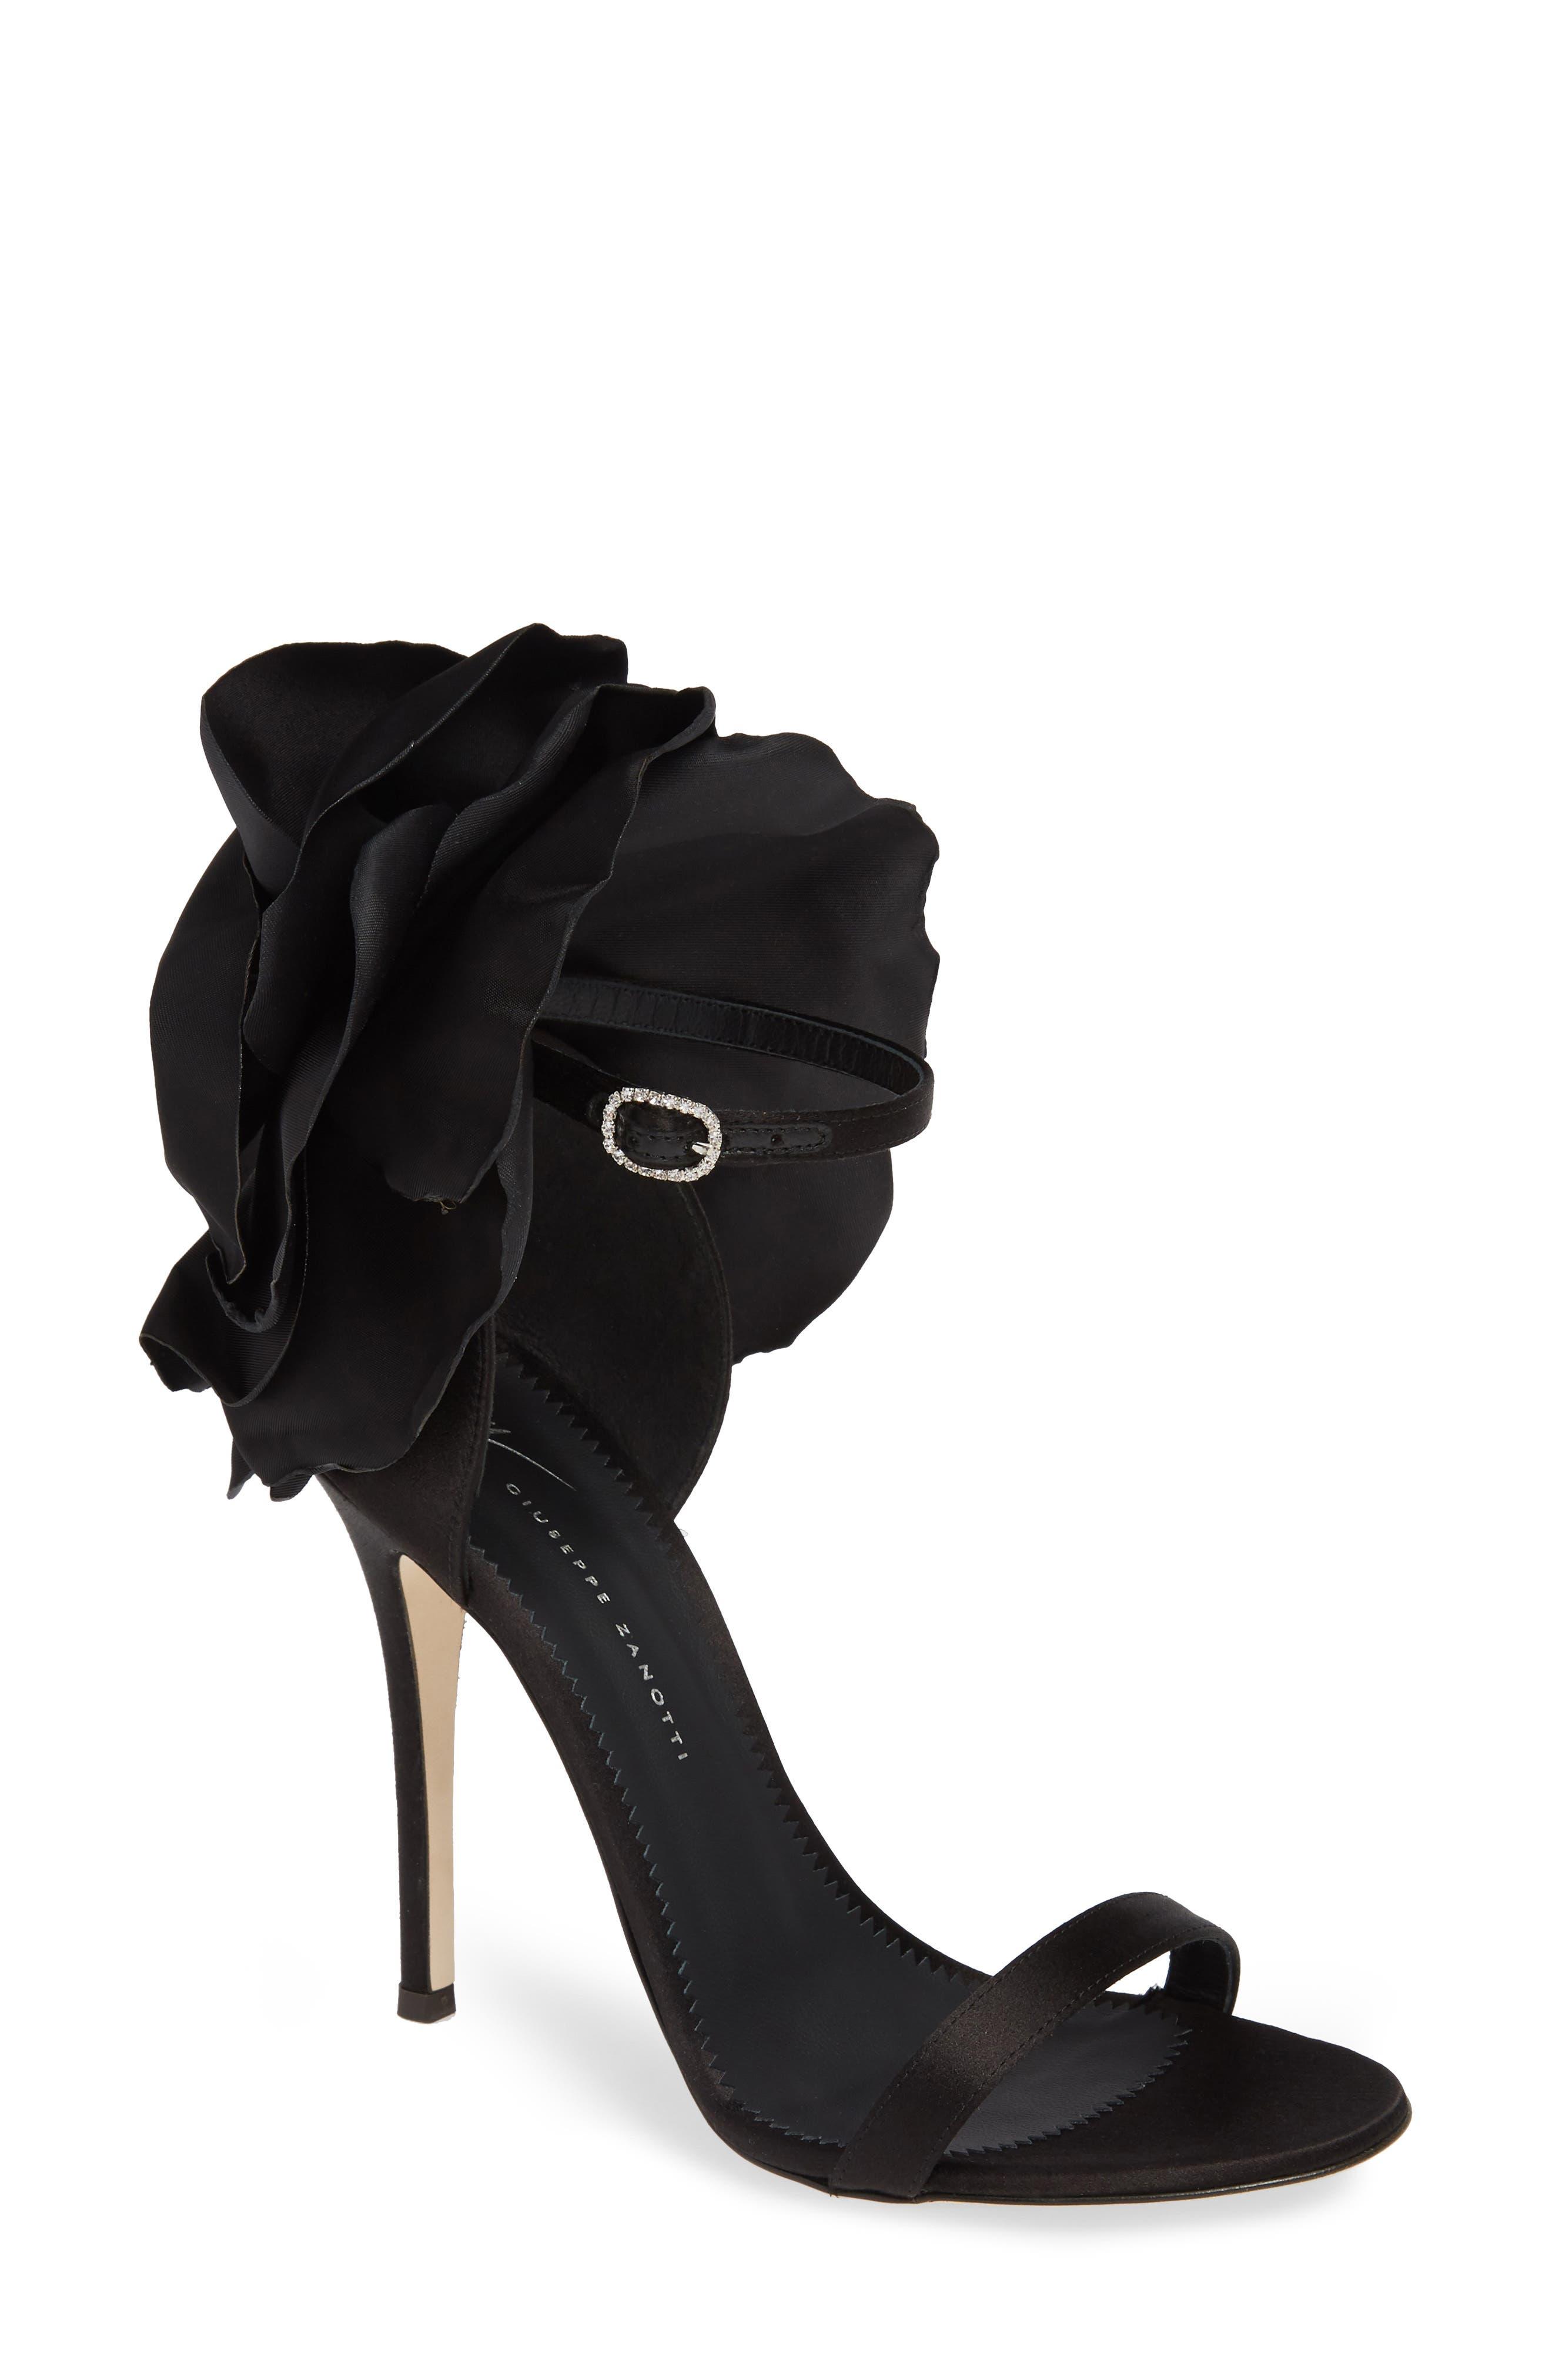 Blooming Flower Ankle Strap Sandal,                             Main thumbnail 1, color,                             BLACK